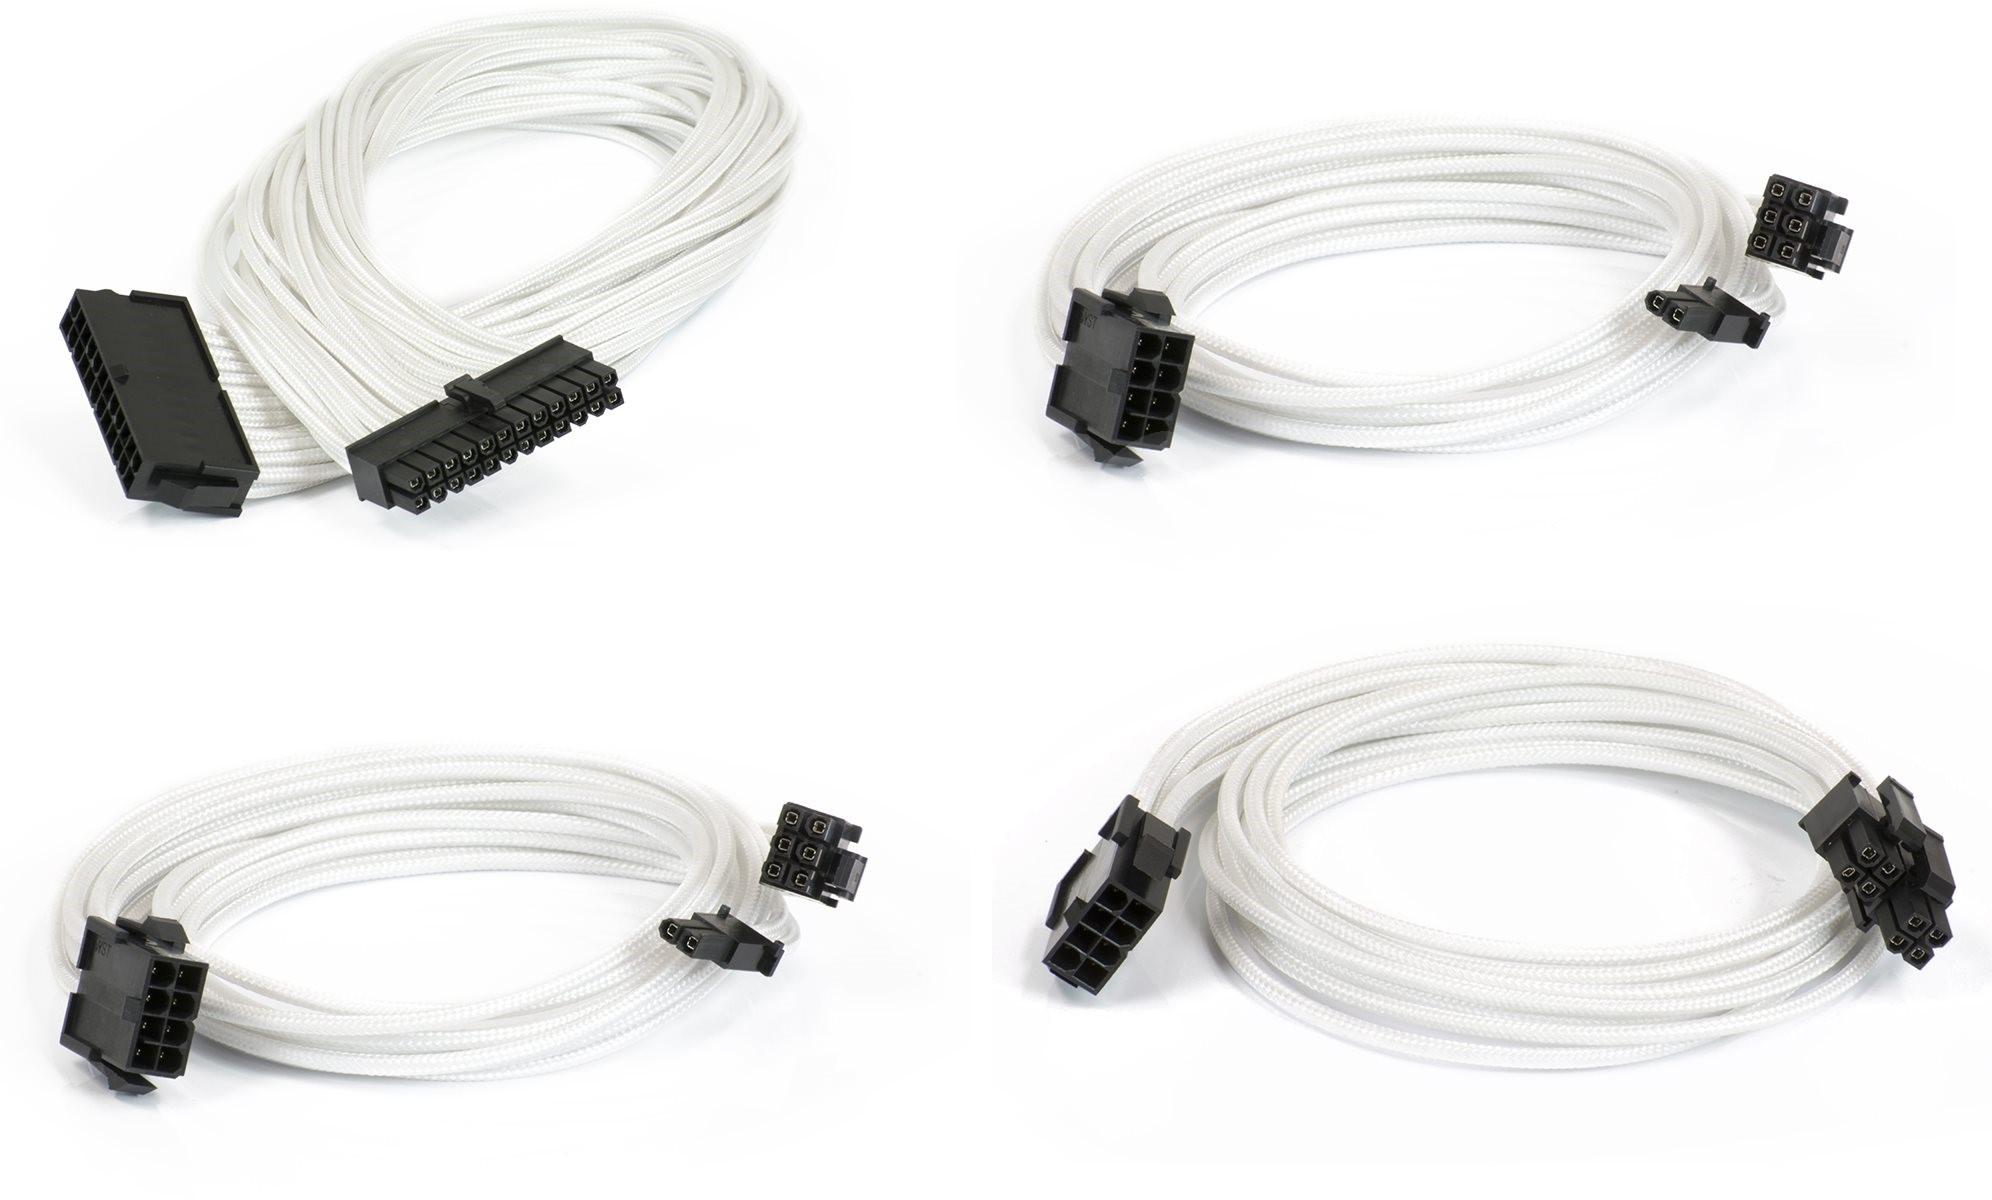 Phanteks Extension Cable Set B 237 L 225 Nap 225 Jec 237 Kabel Alza Cz